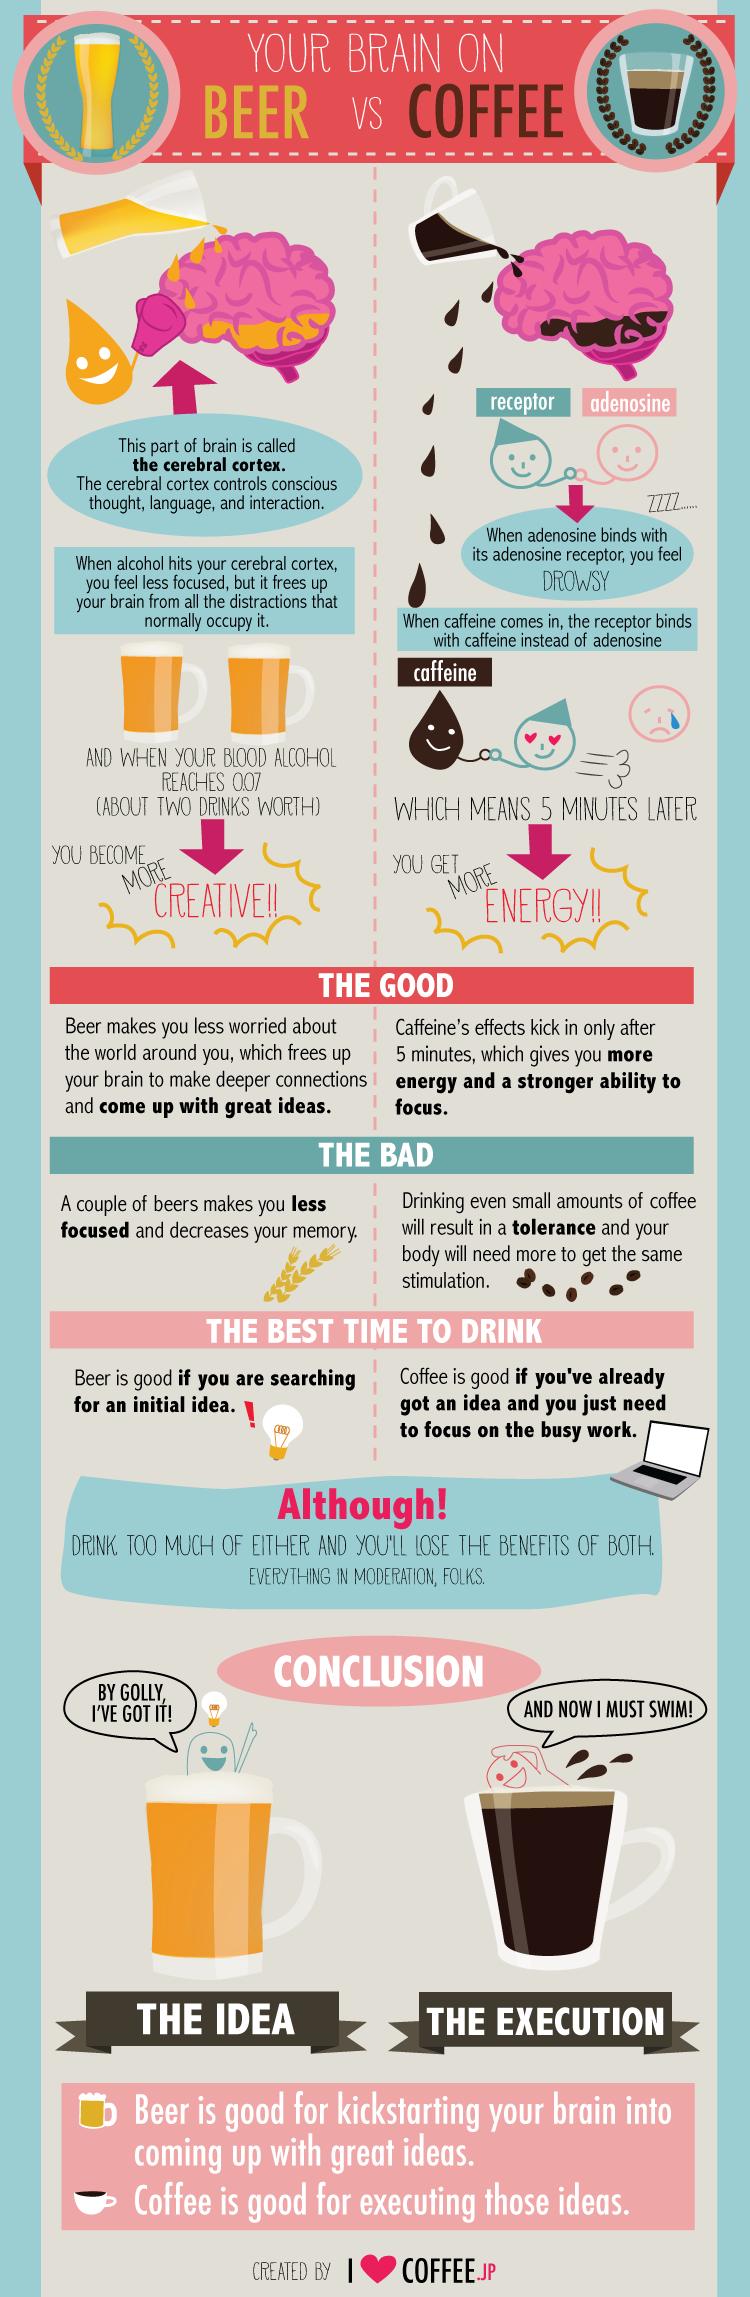 Your-brain-on-beer-vs.-coffee.